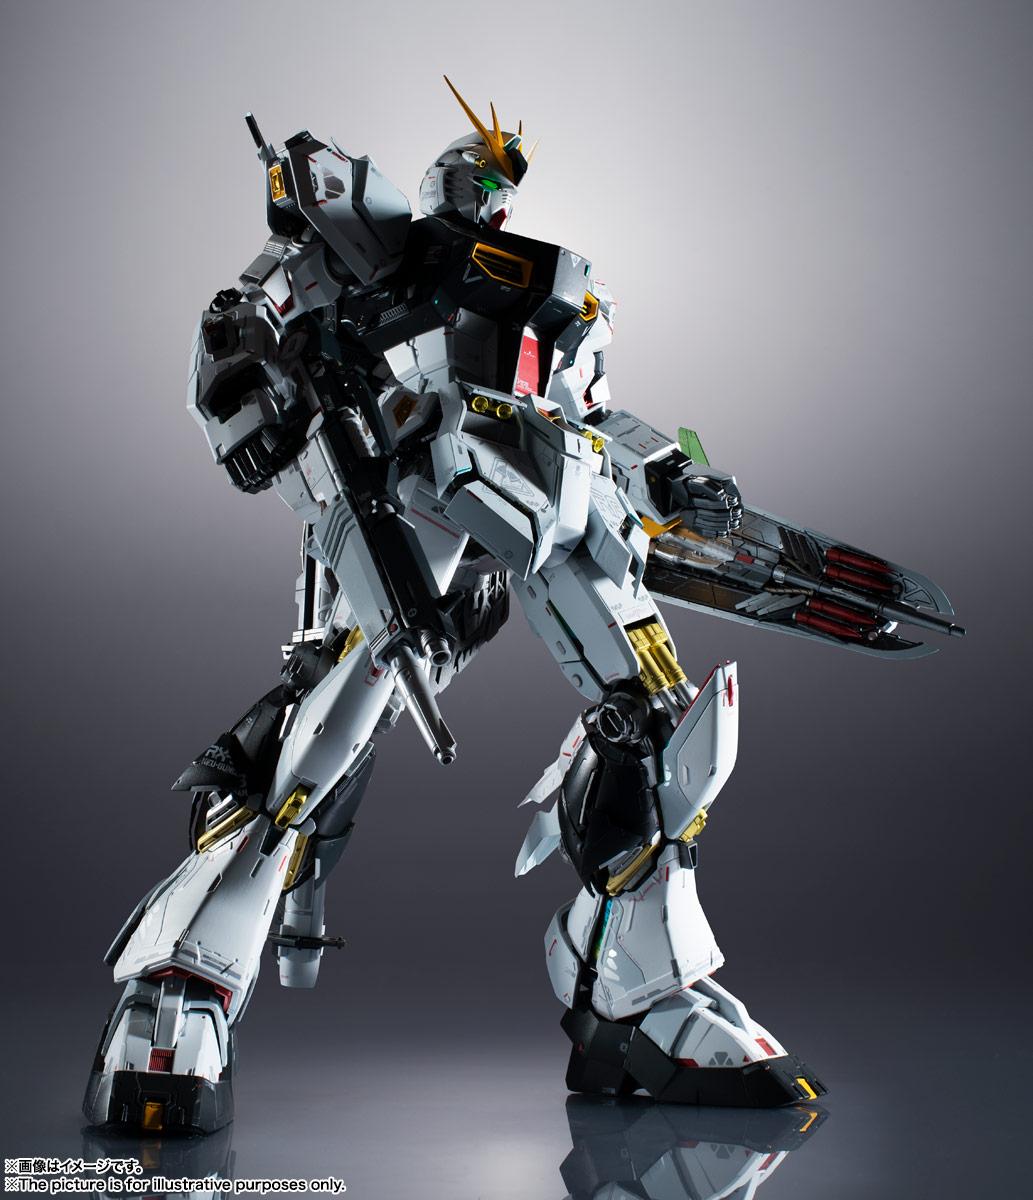 METAL STRUCTURE 解体匠機『RX-93 νガンダム』可動フィギュア-003